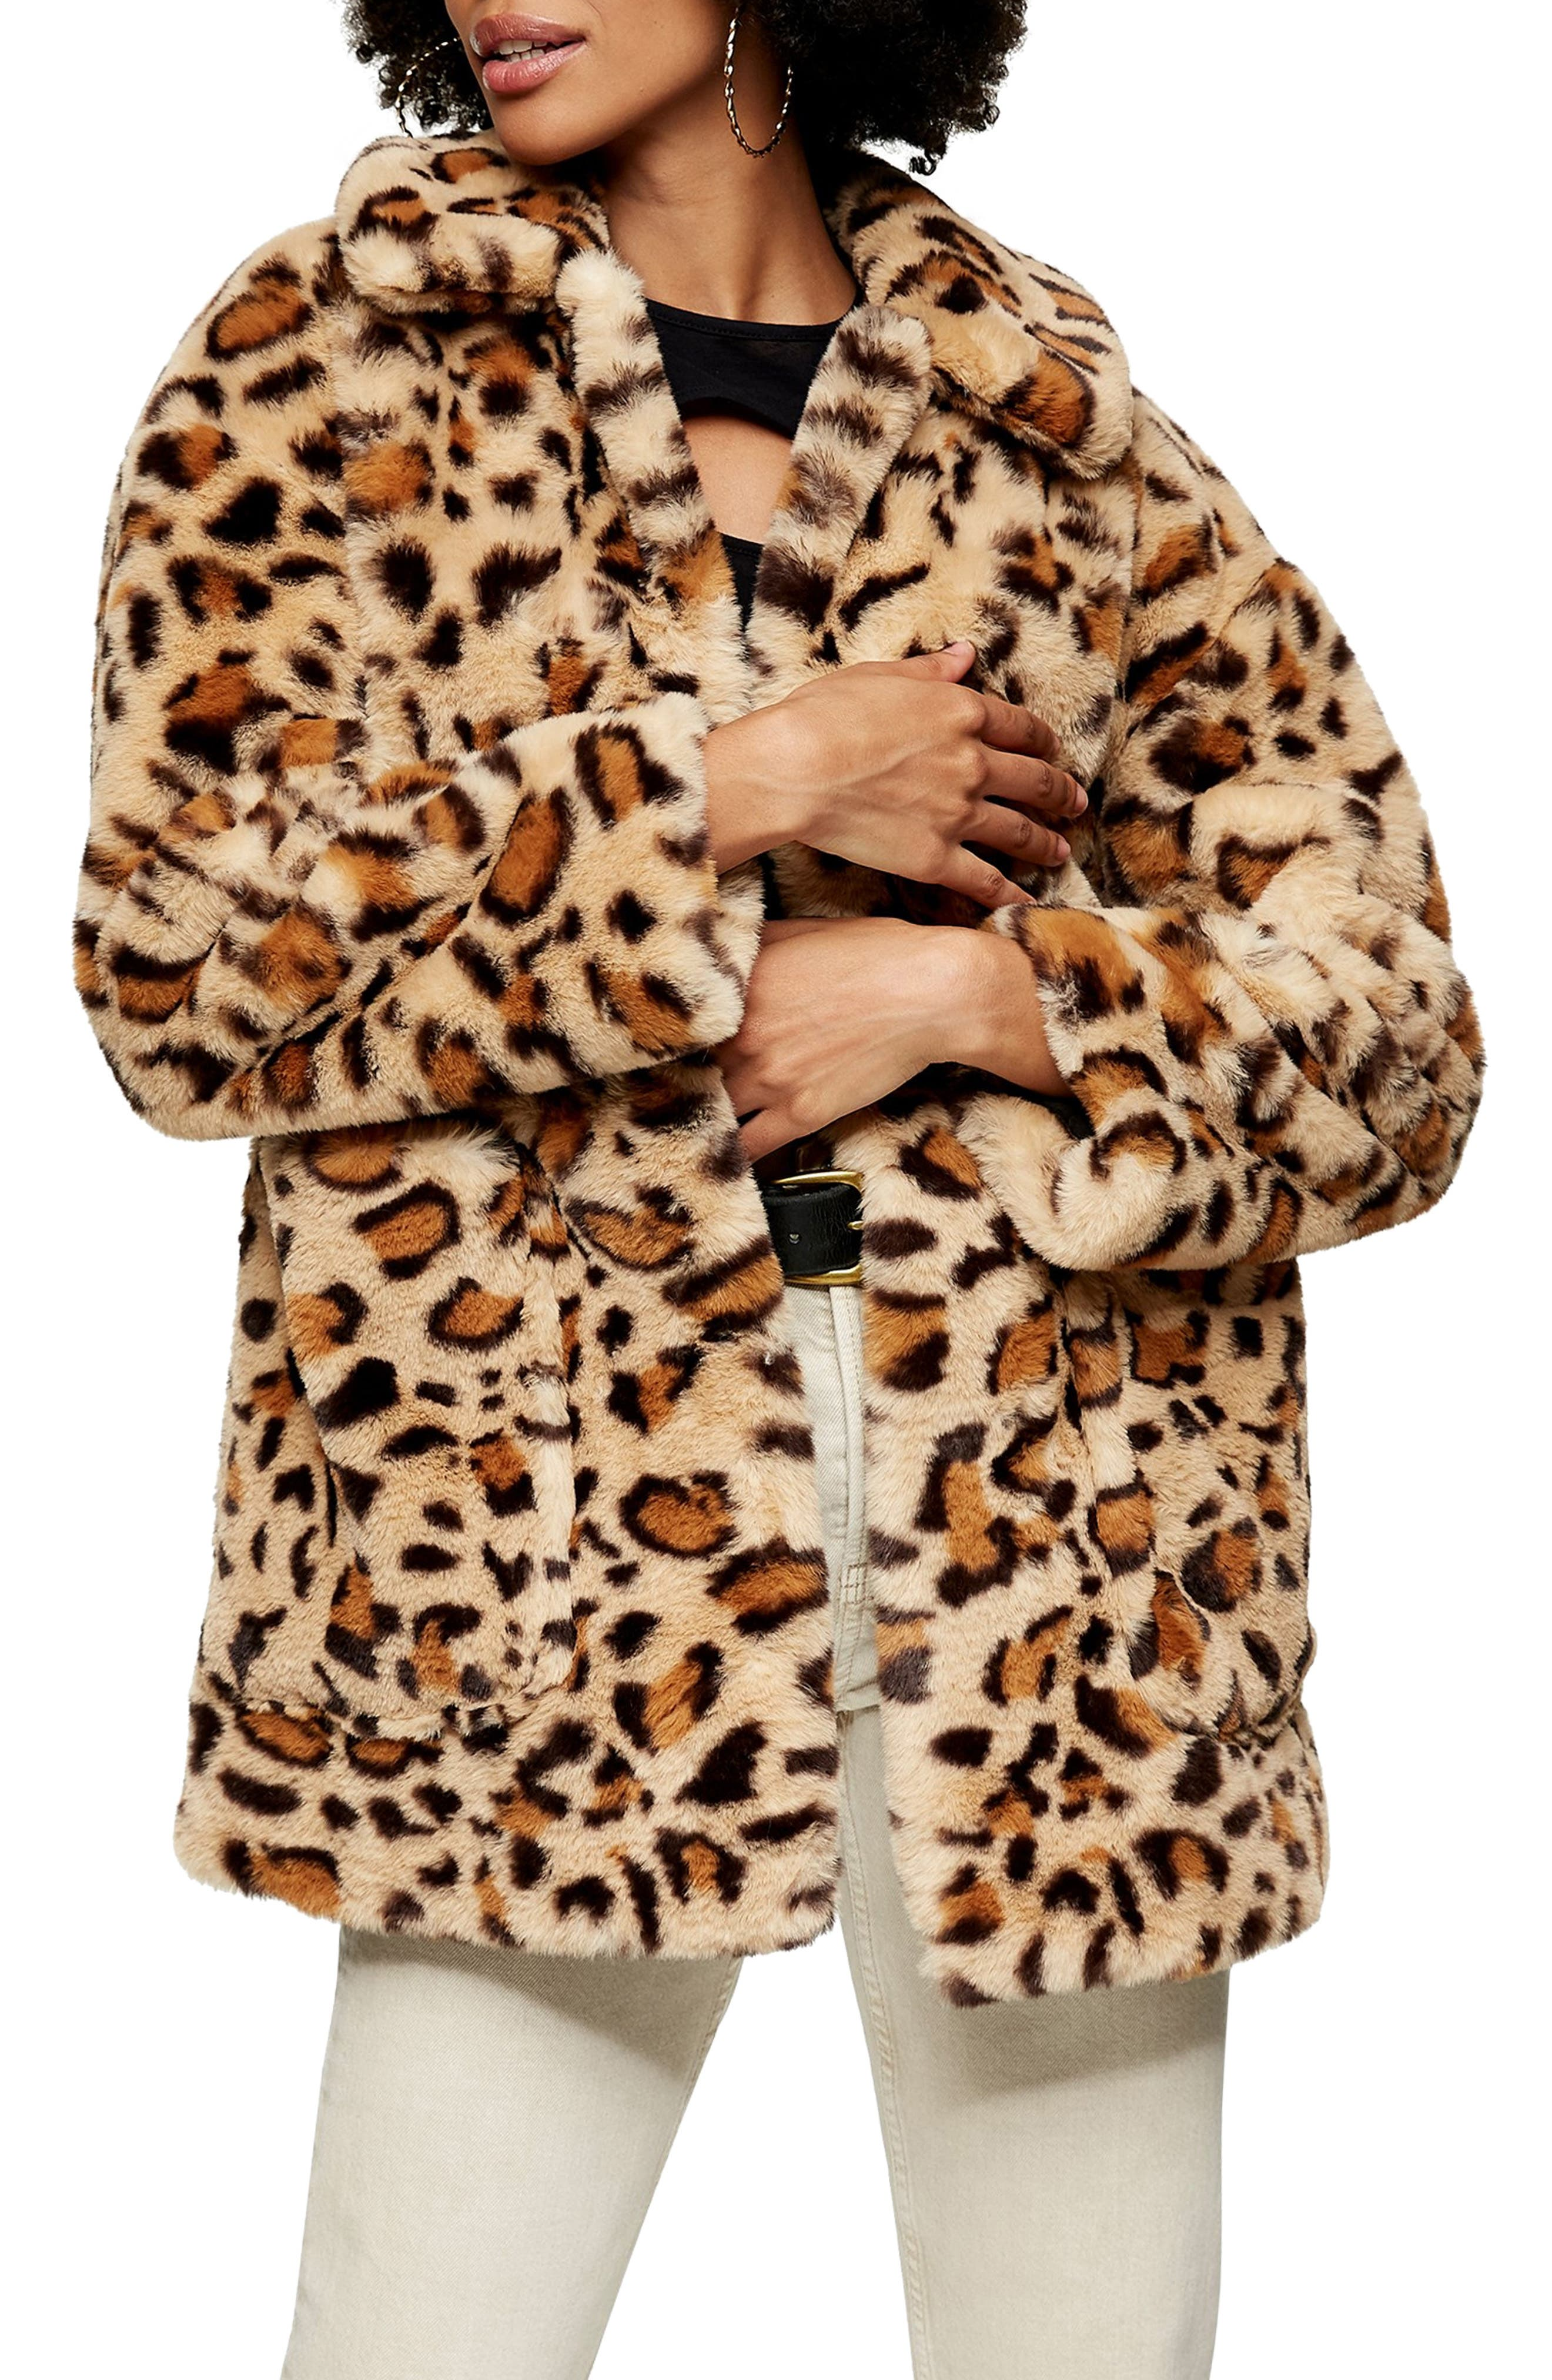 Topshop Furs EDDIE LEOPARD PATTERN FAUX FUR JACKET